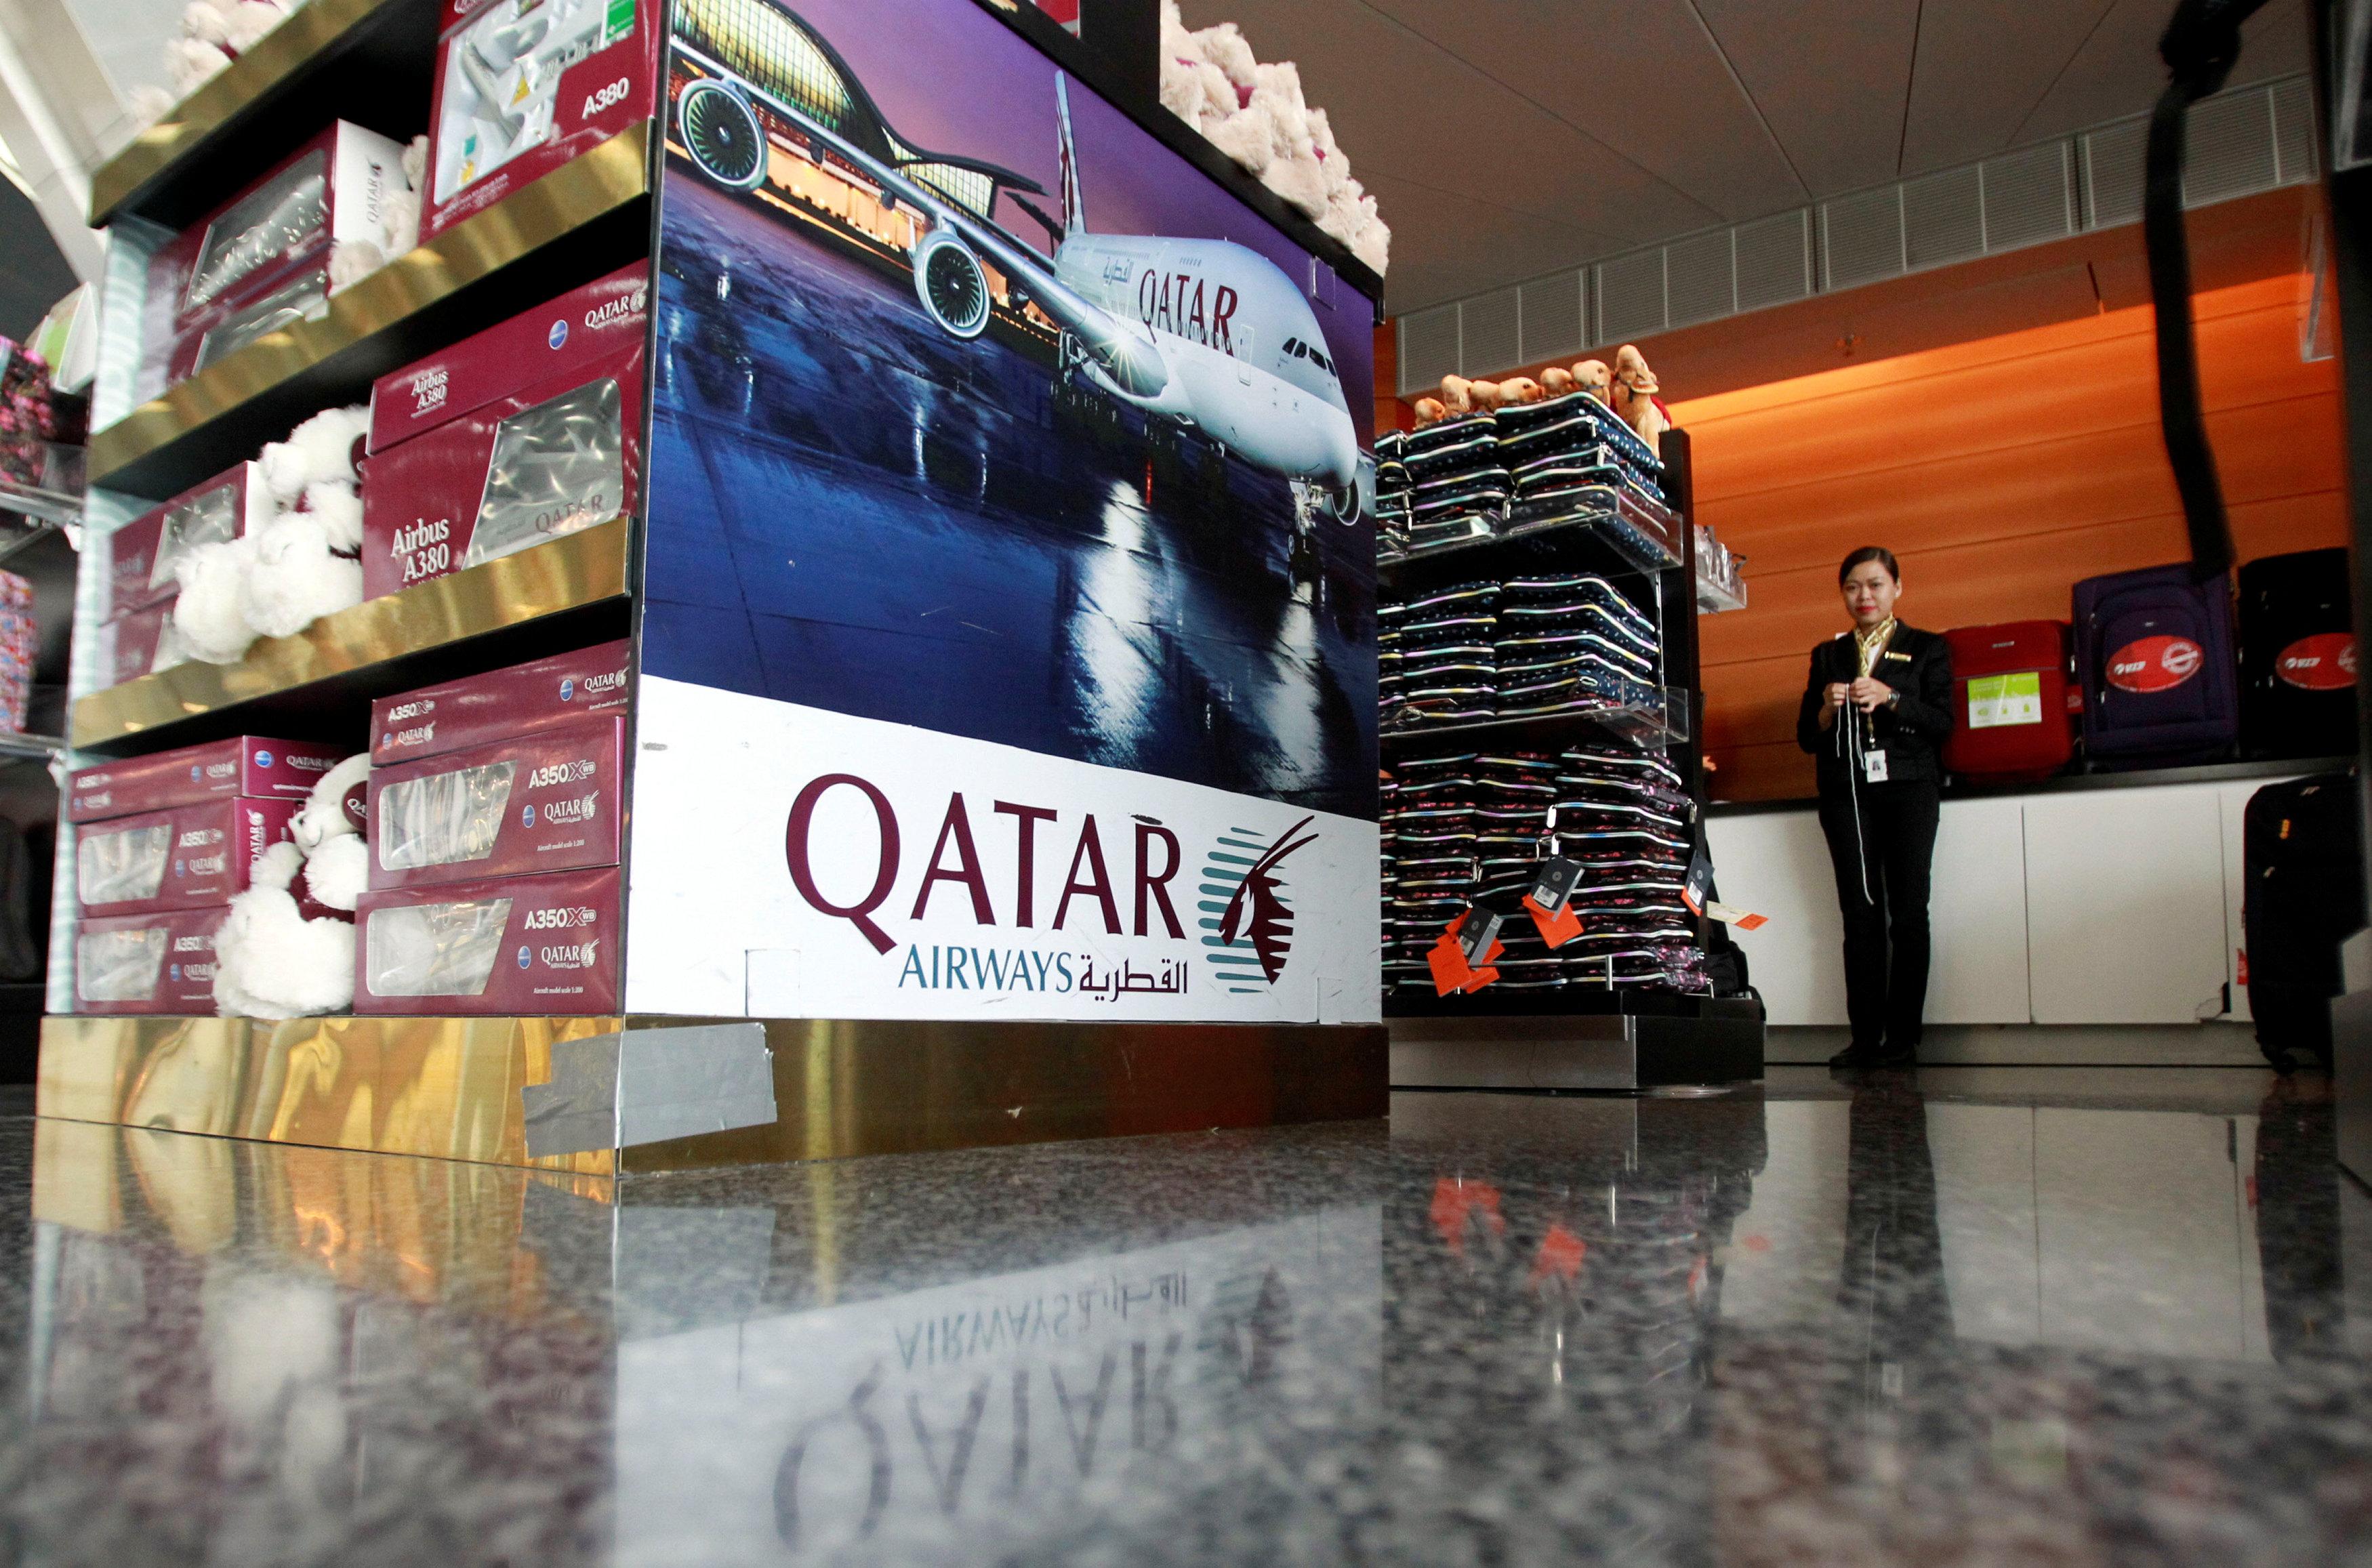 A sign of Qatar Airways is seen at Hamad International Airport in Doha, Qatar on June 7, 2017. (REUTERS/Naseem Zeitoon)